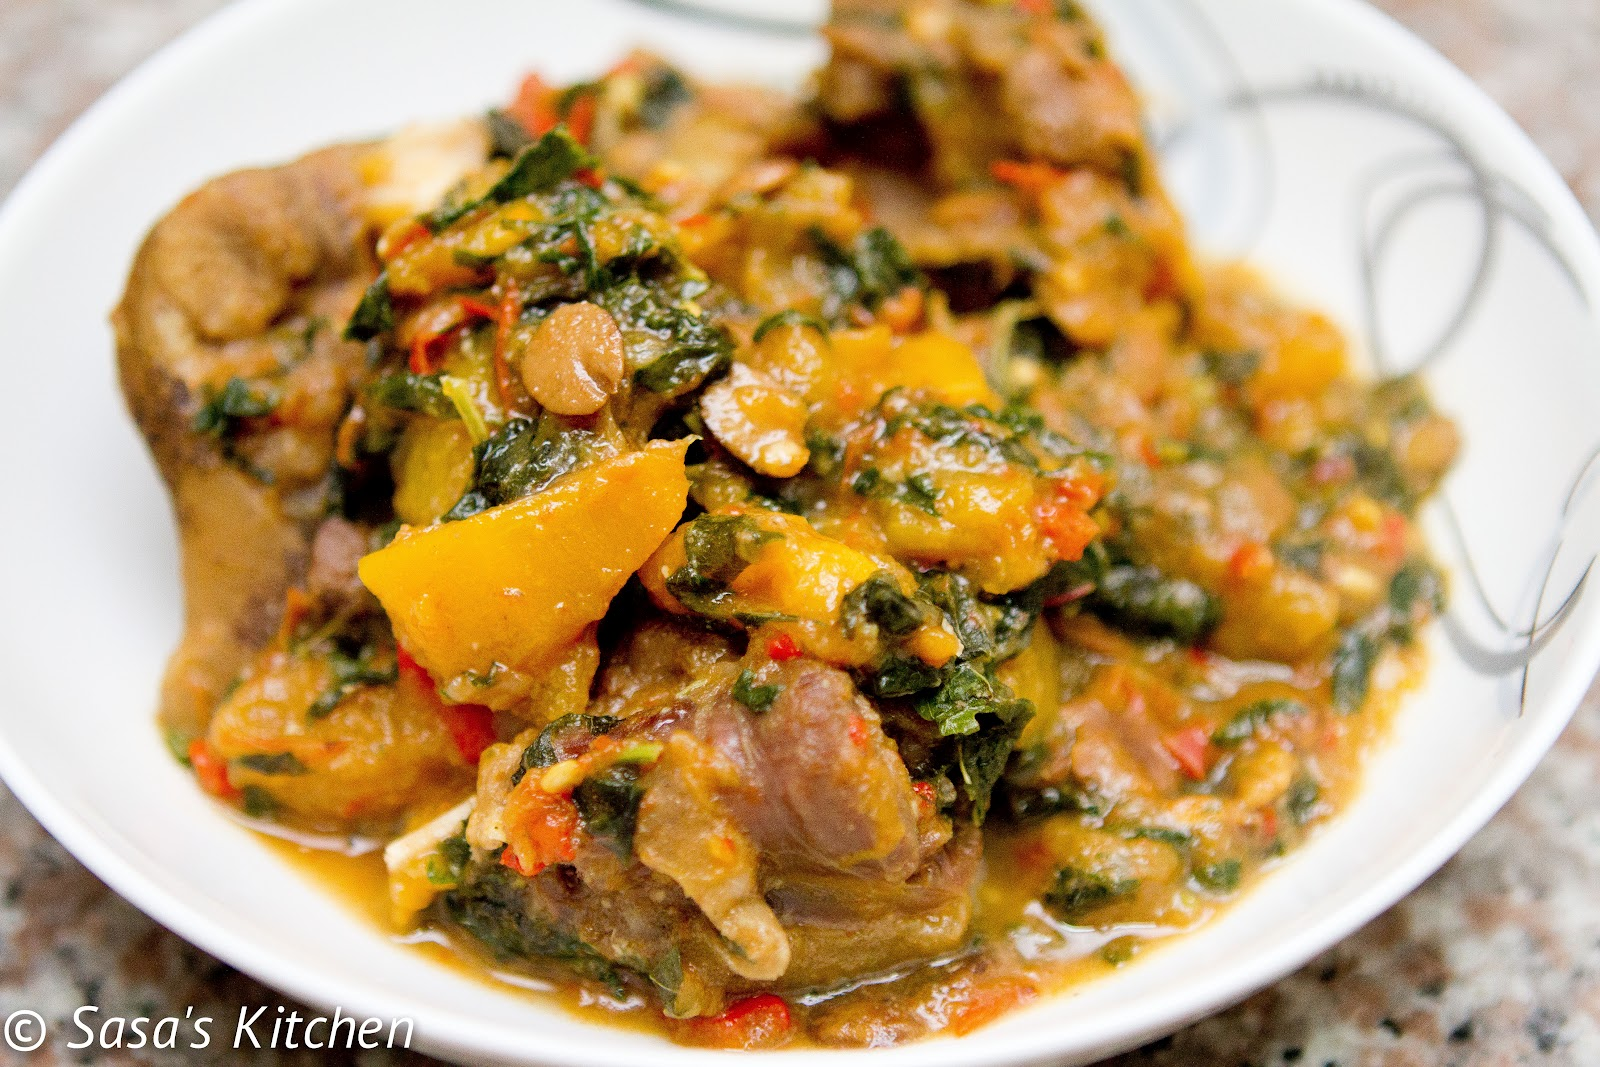 EBA: African Cuisine